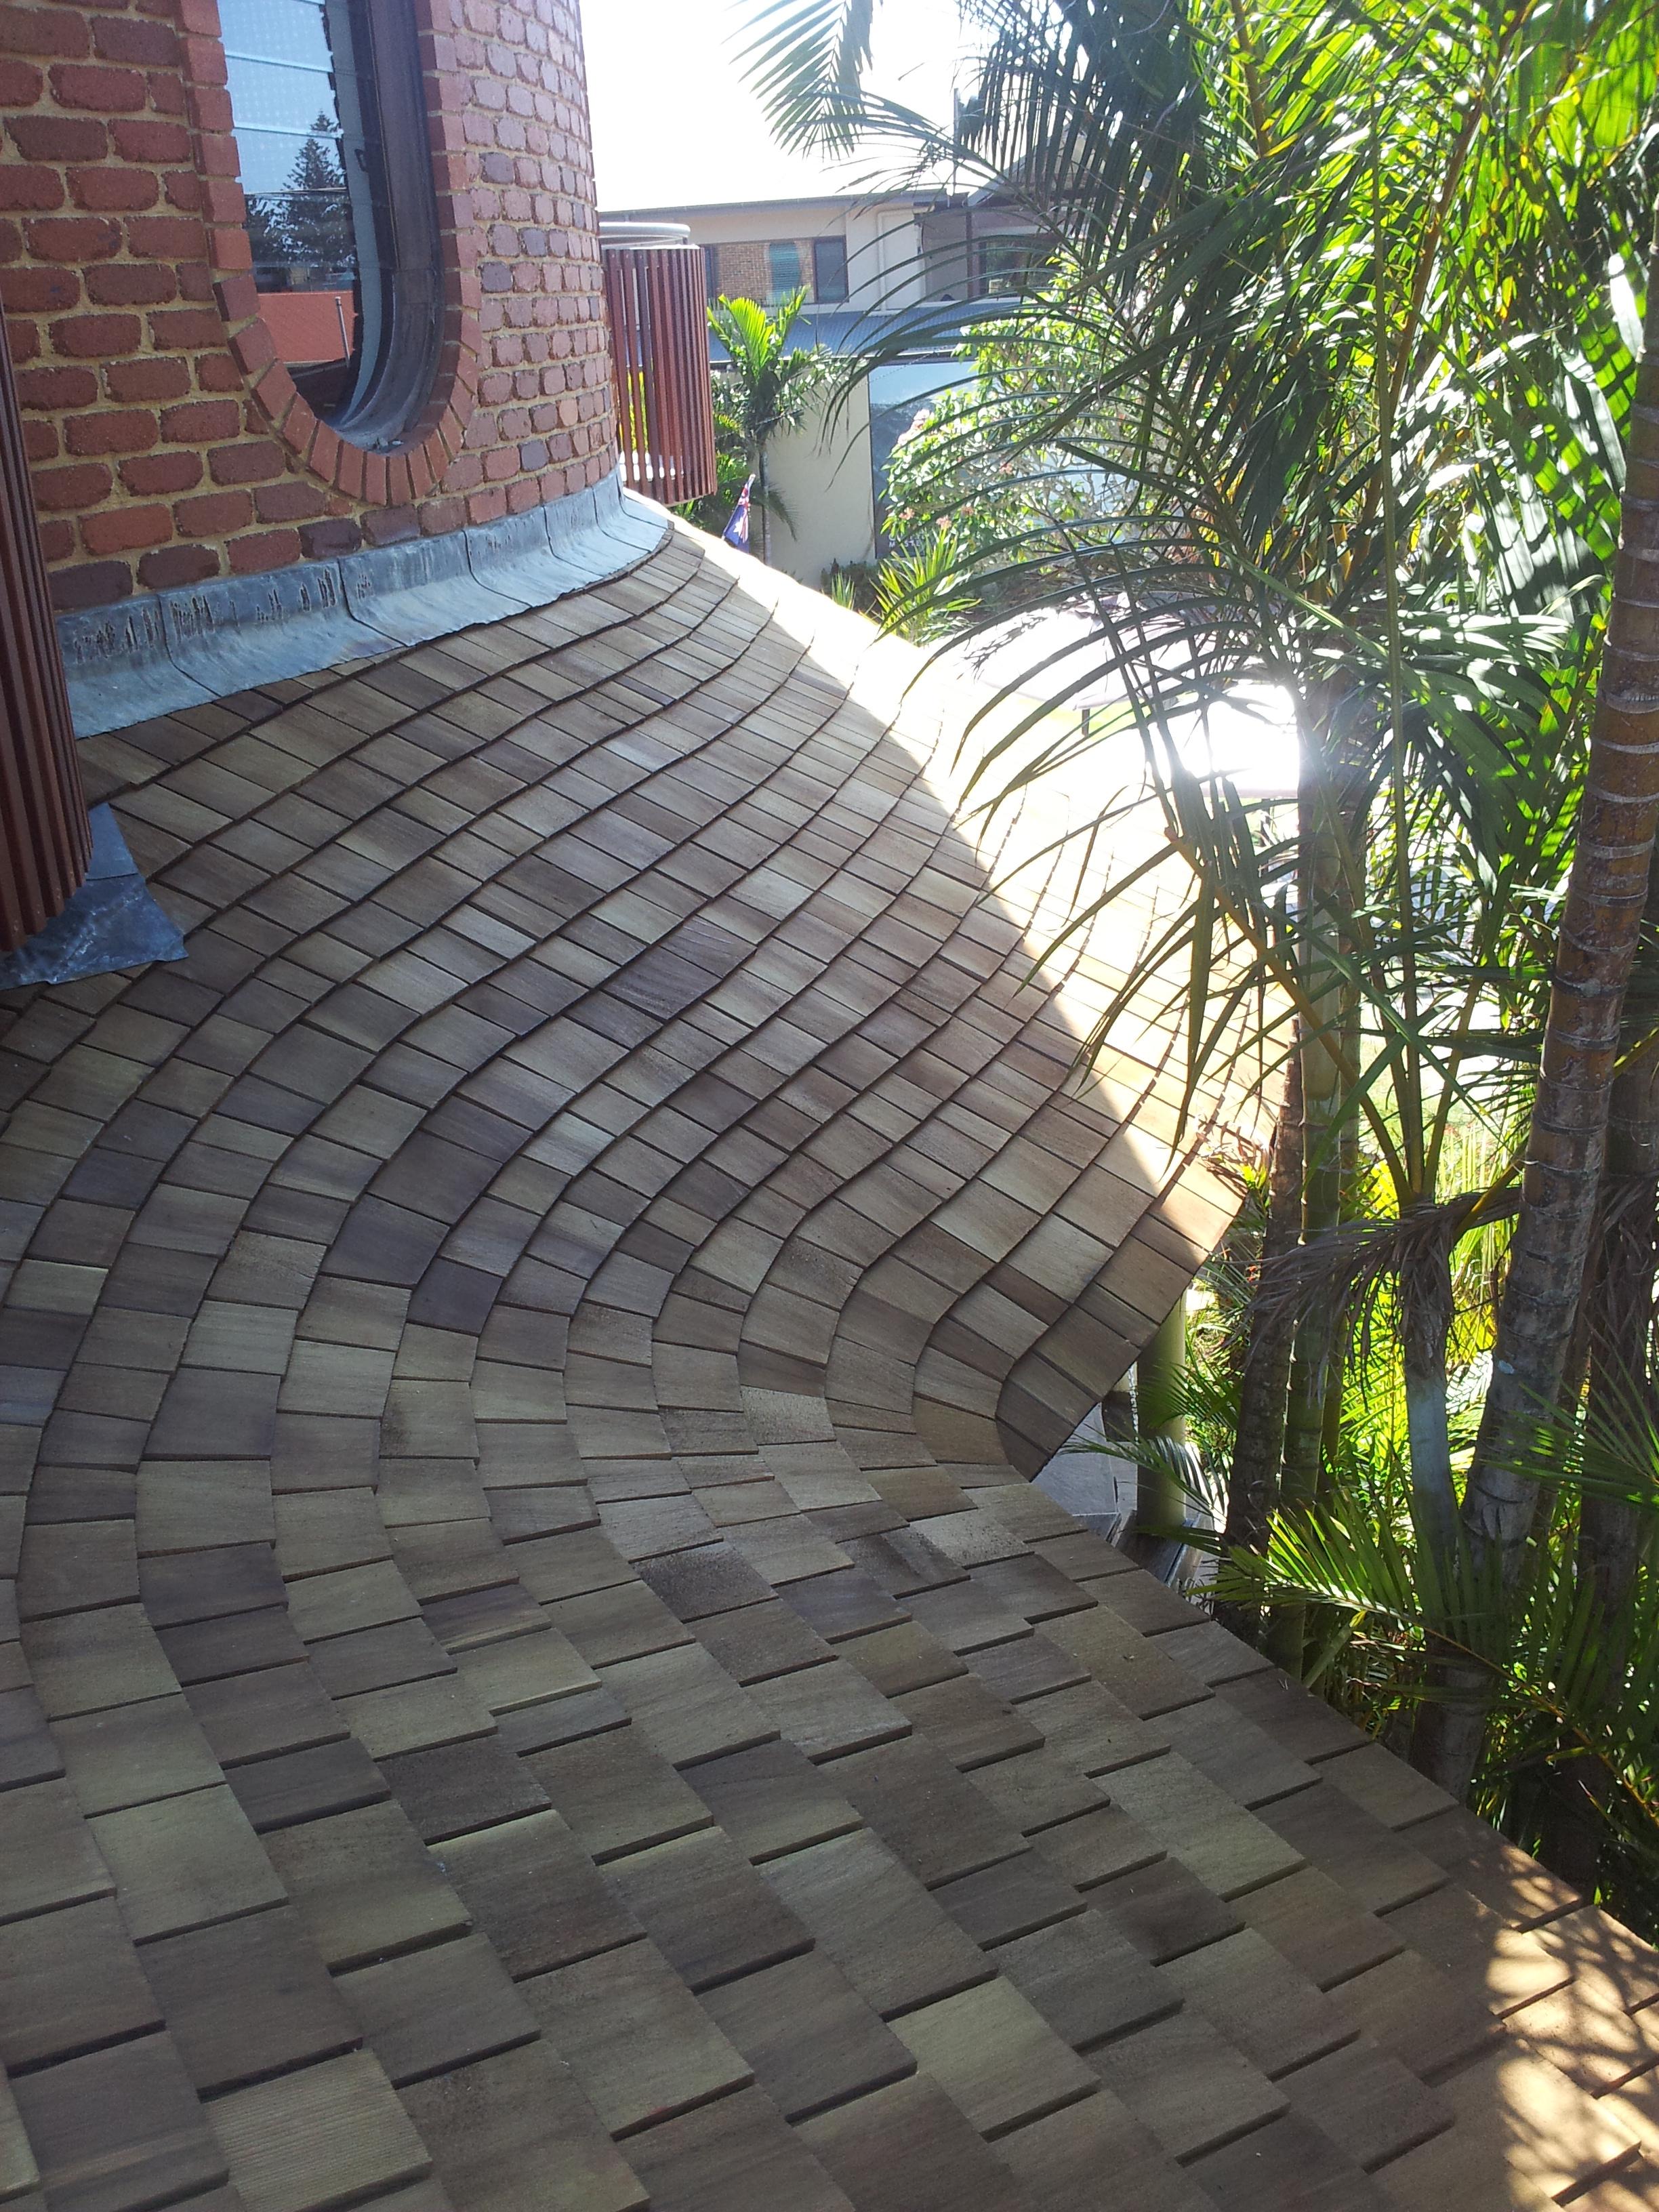 Curvy-licious Cedar Roofing